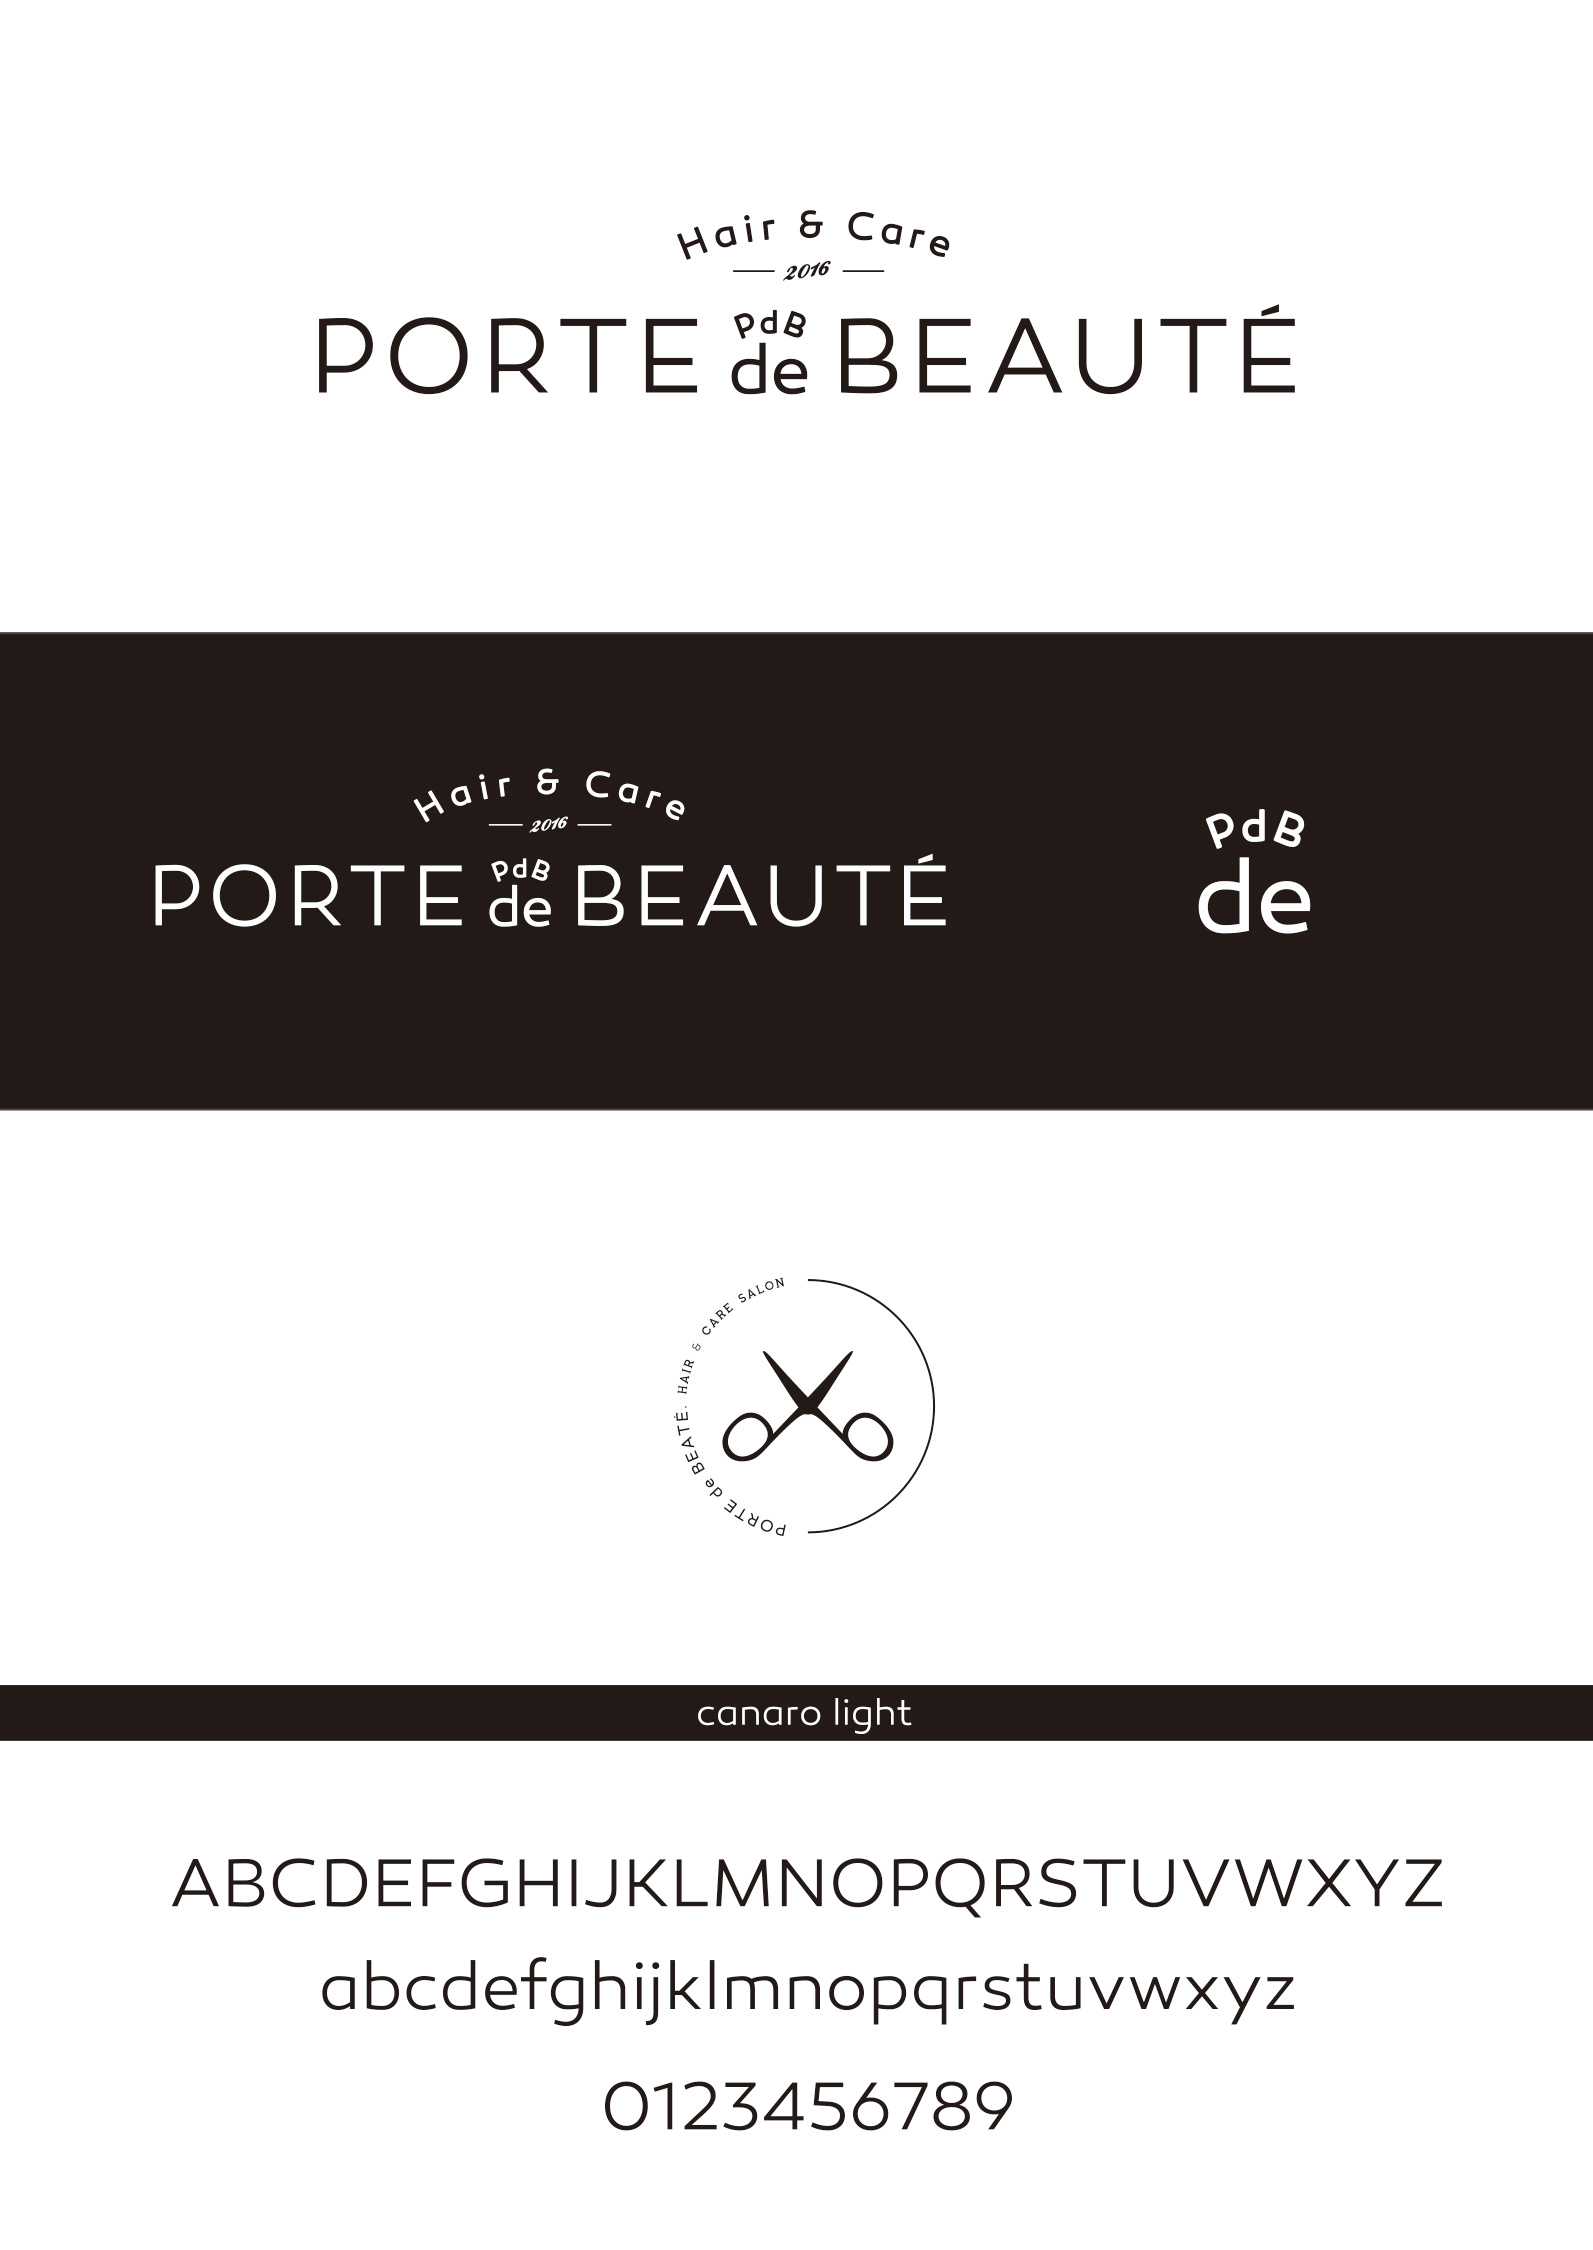 [Porte_de_Baeute]様logo